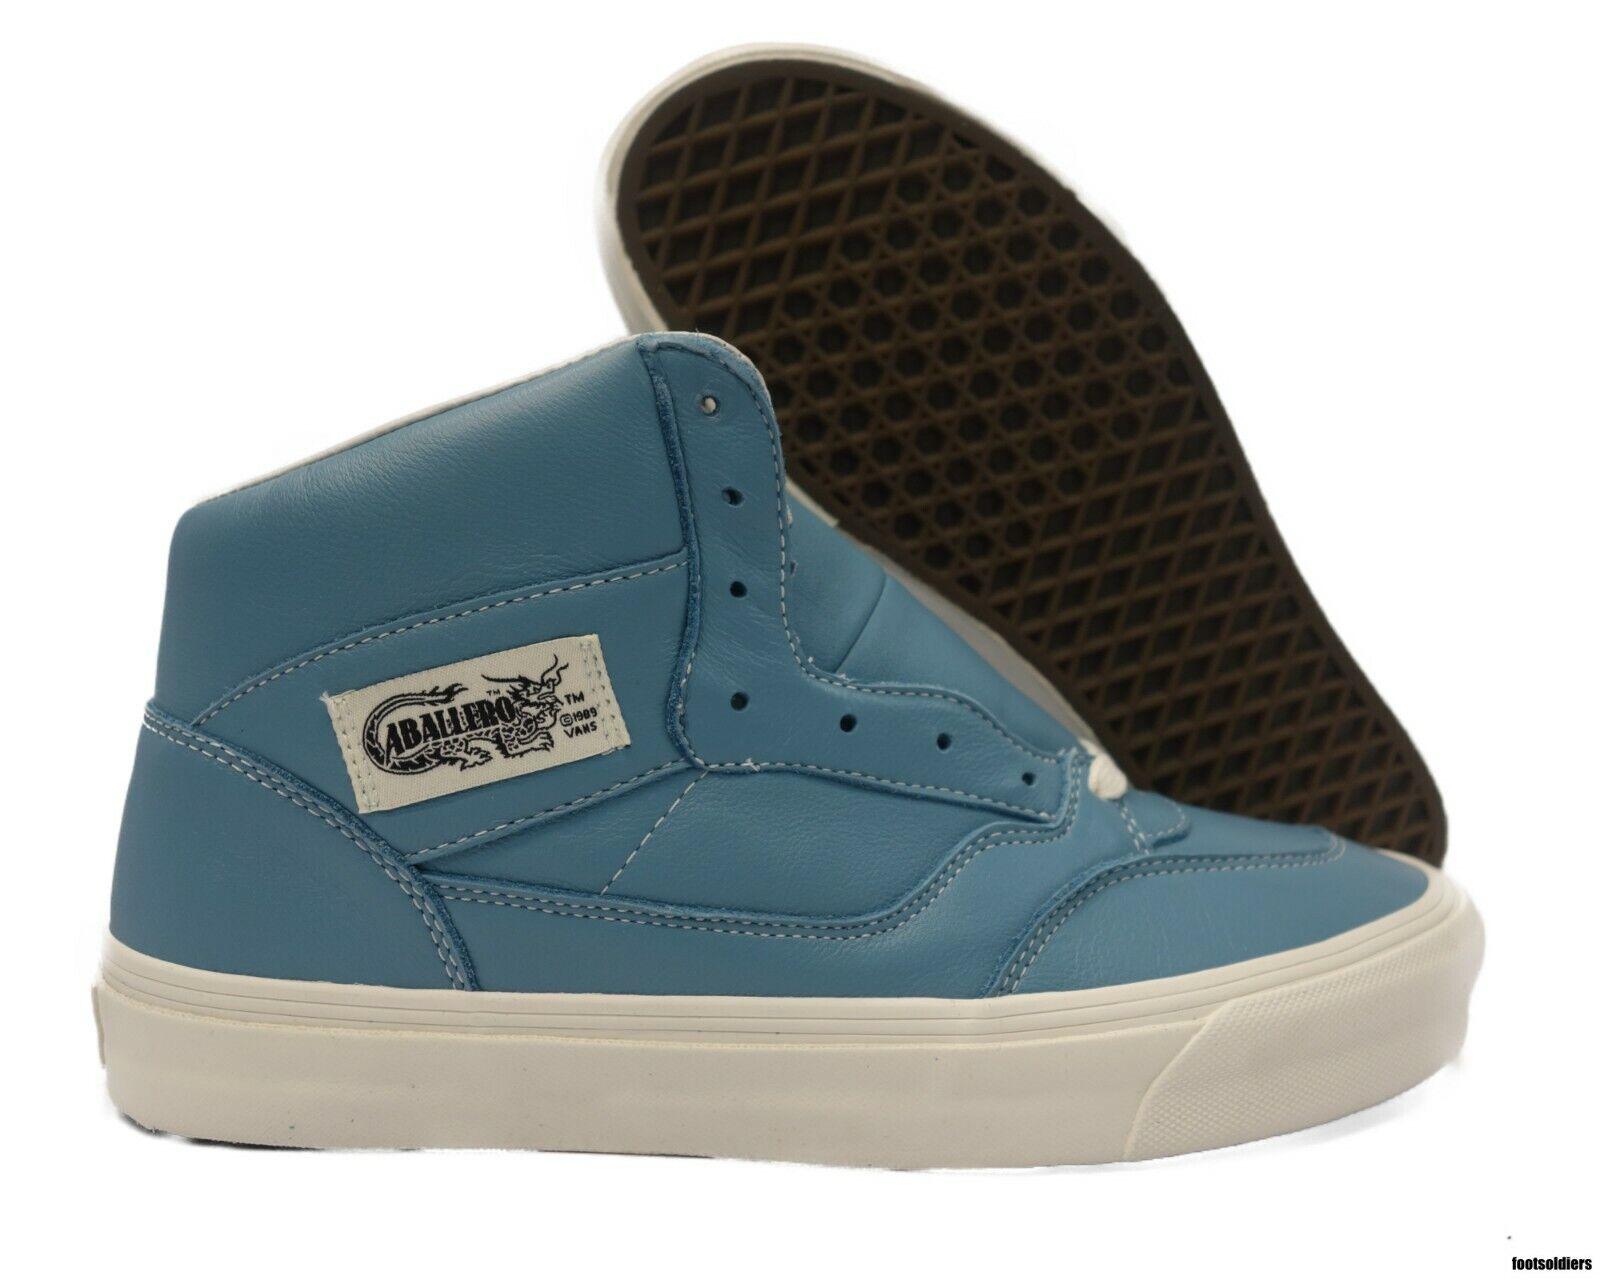 VN0A3JOZORQ Vans OG Full Cab LX Leather (Adriatic bluee) Men Size 9.5